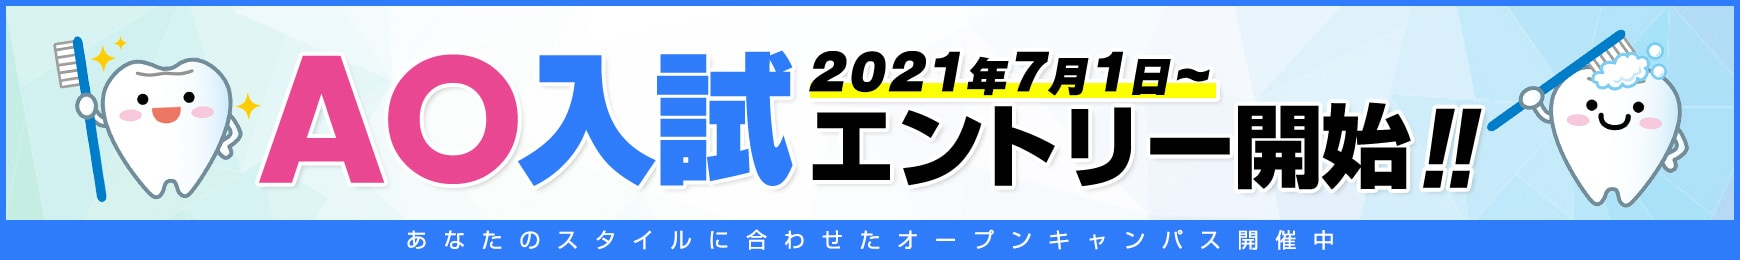 AO入試2021年7月1日〜エントリー開始